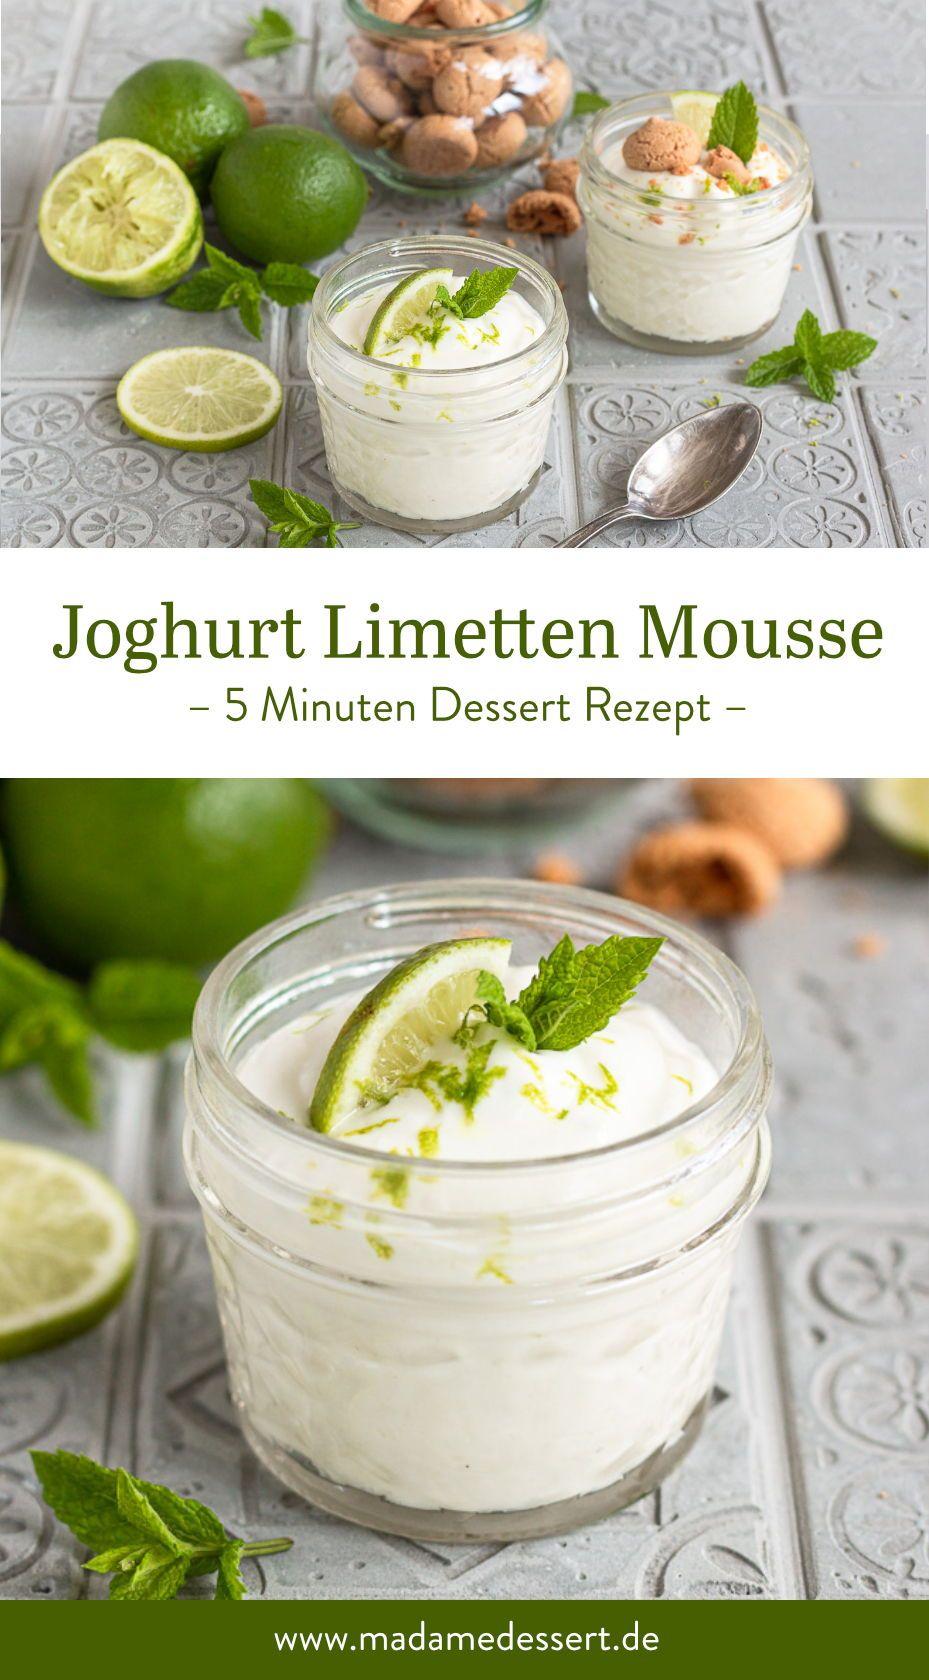 Joghurt Limetten Mousse